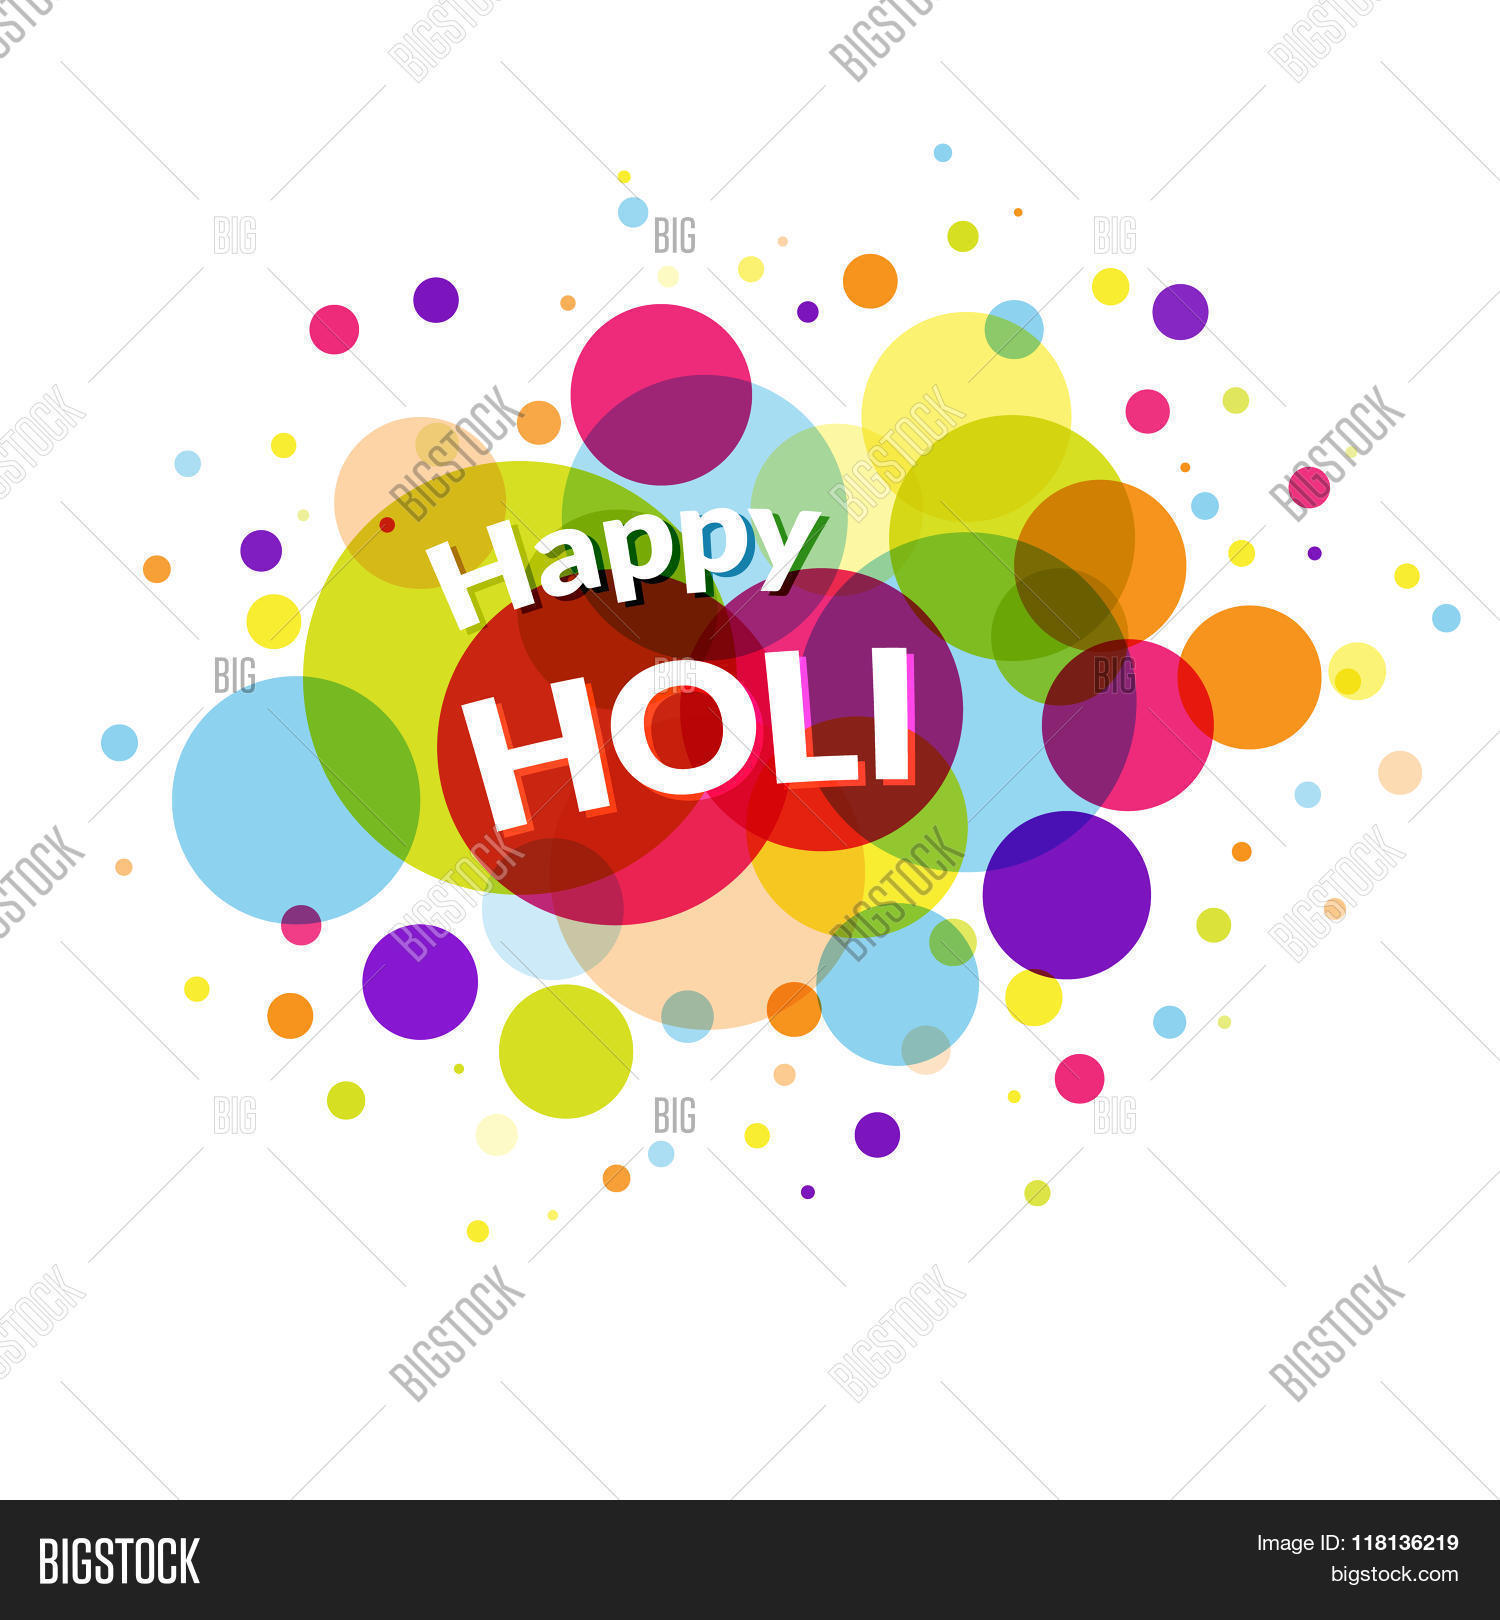 Happy holi greeting vector photo free trial bigstock happy holi greeting card m4hsunfo